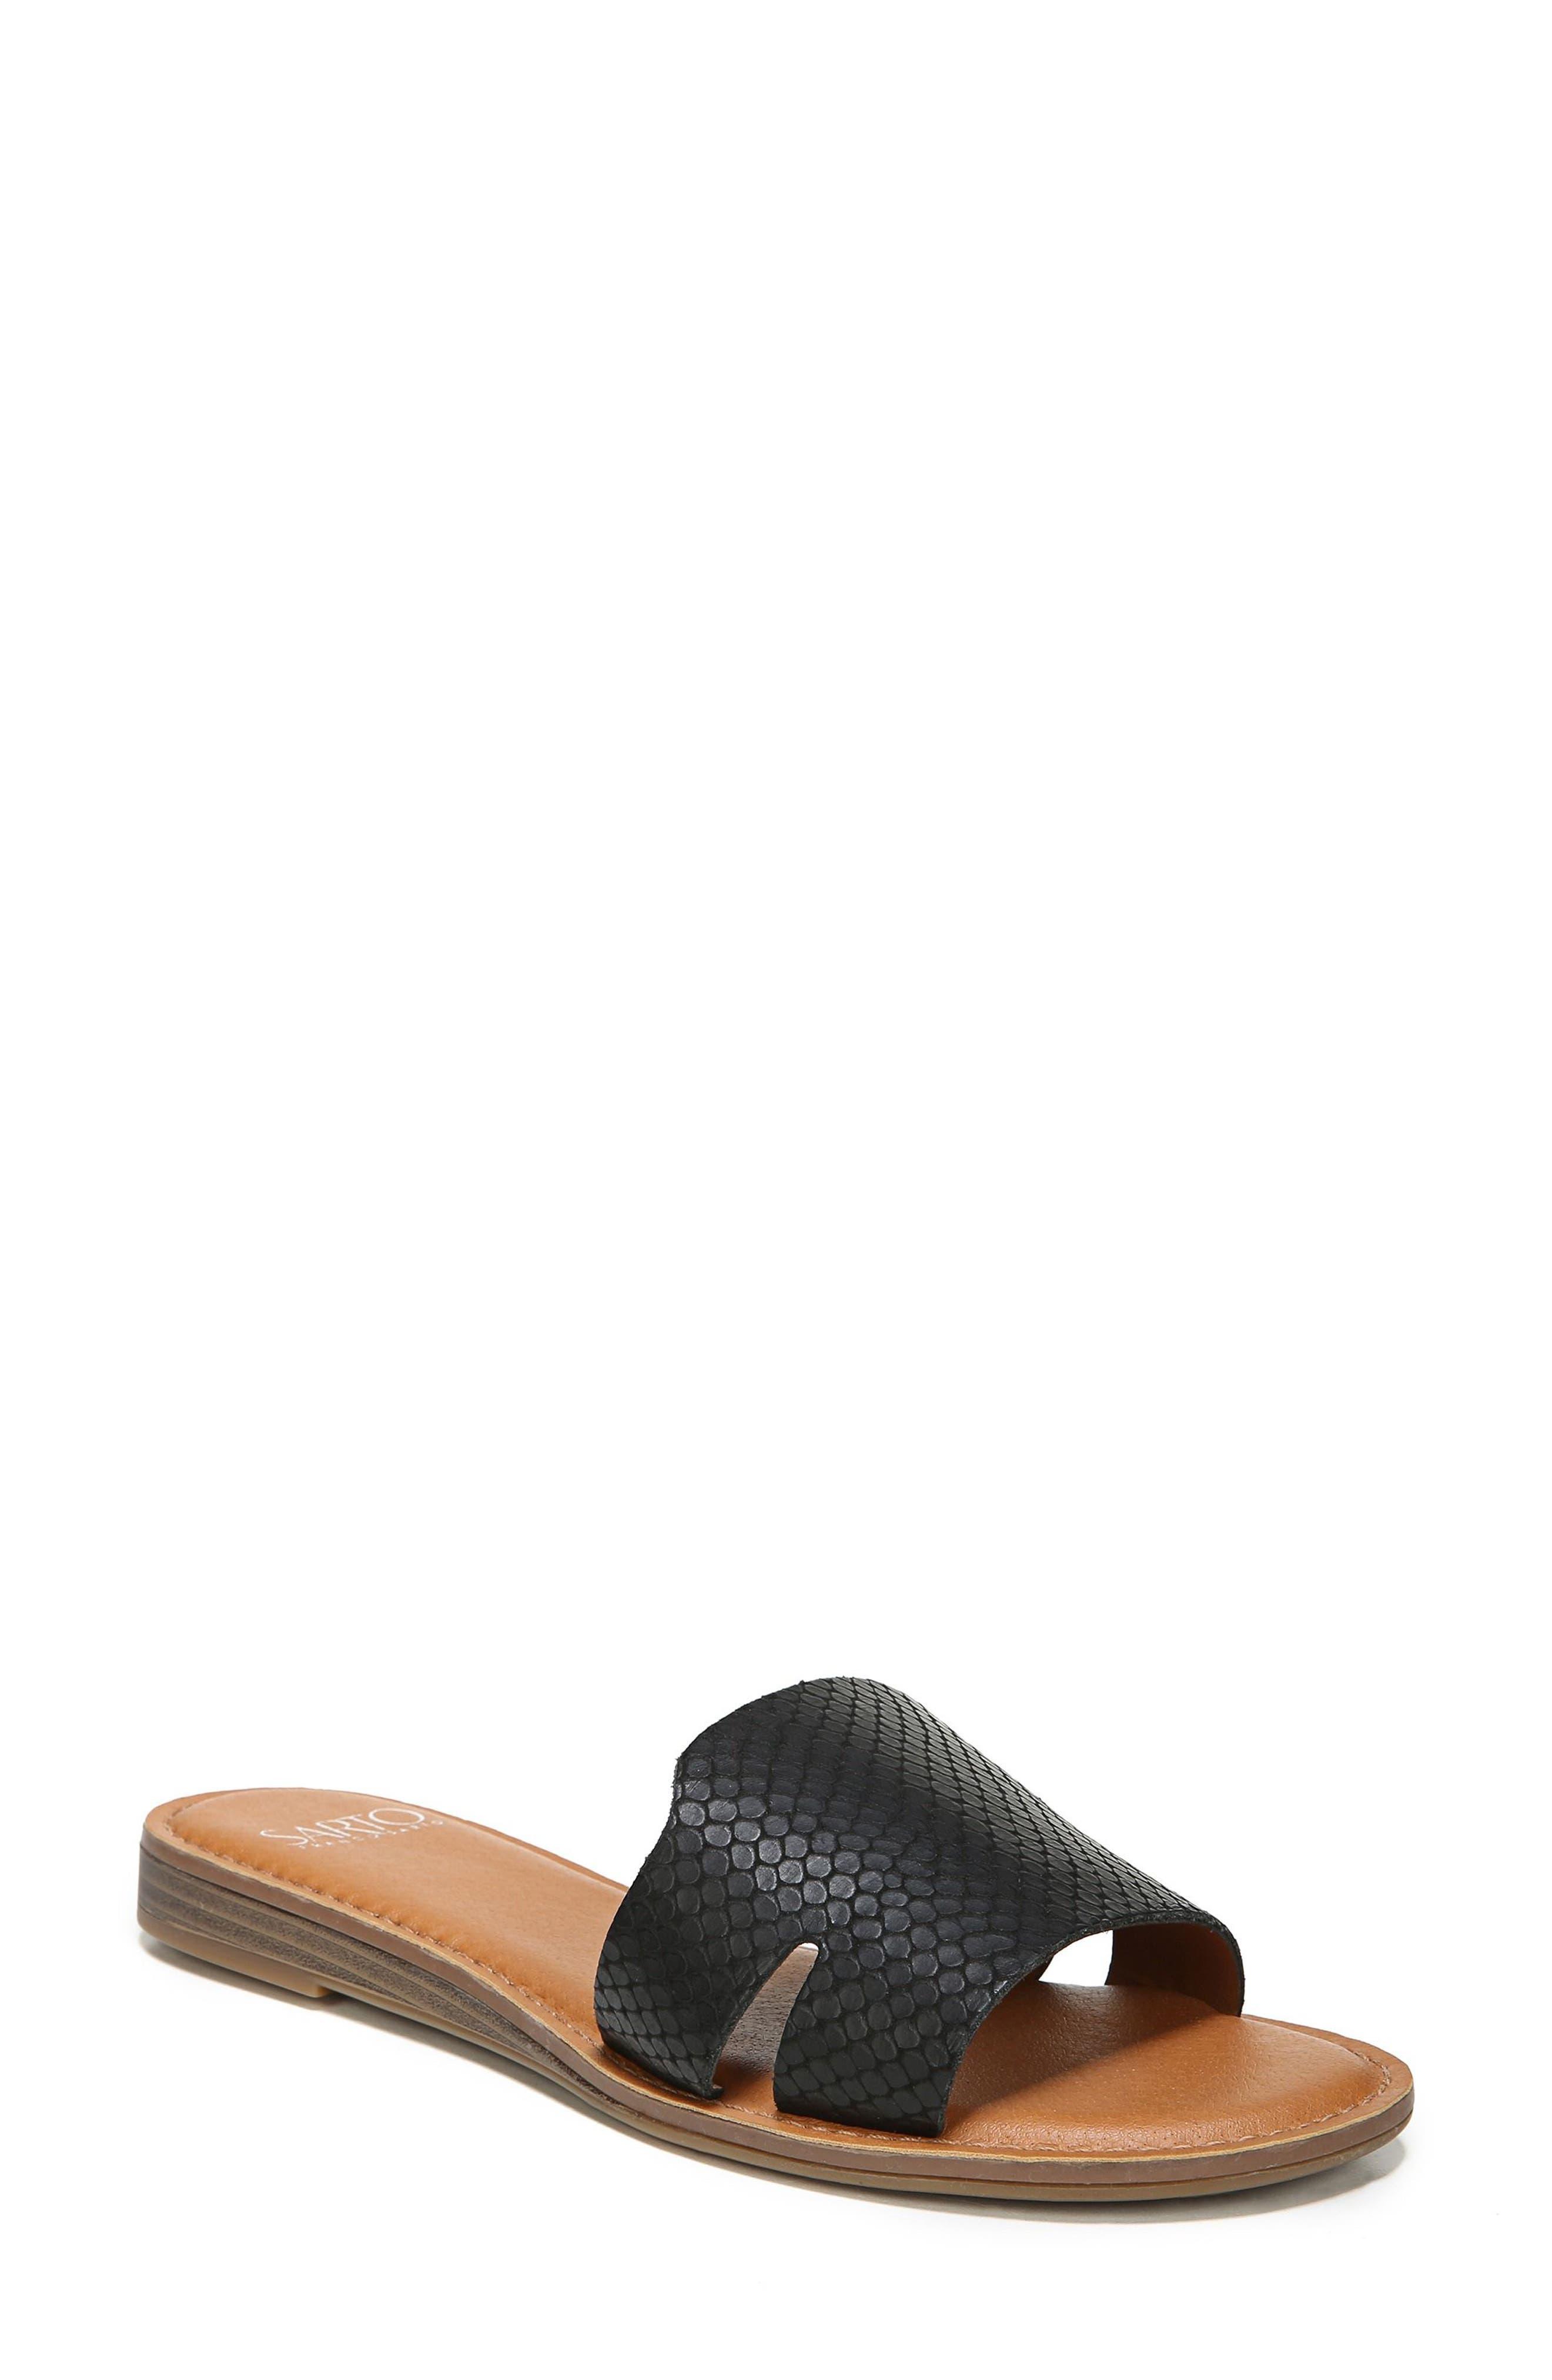 Ginelle Slide Sandal,                         Main,                         color, 001